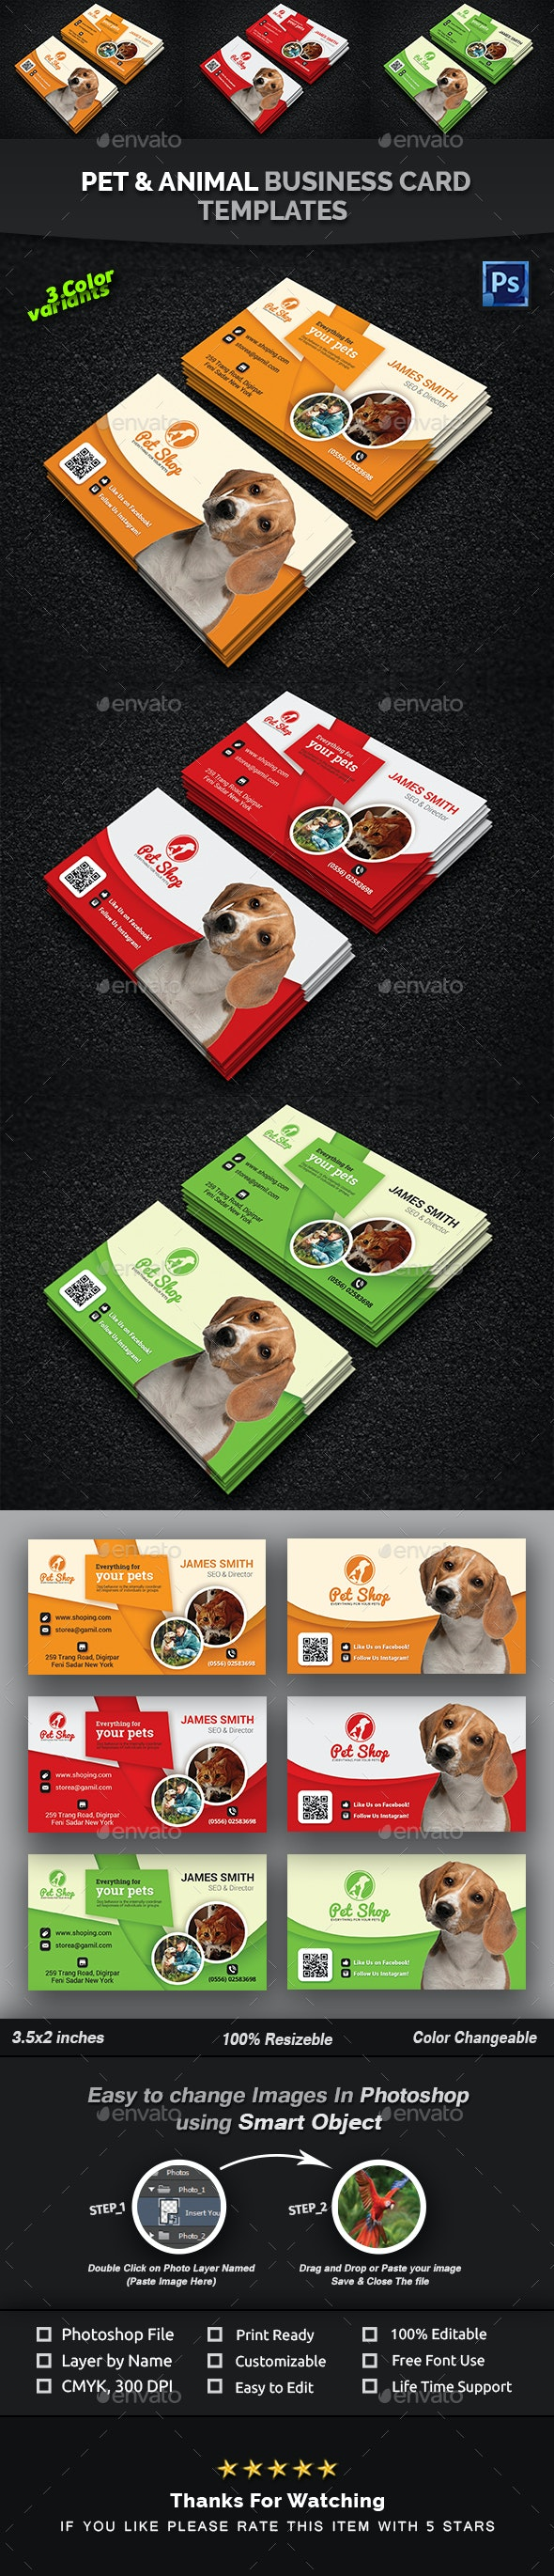 Pet Business Card | Animal Business Card Templates - Creative Business Cards